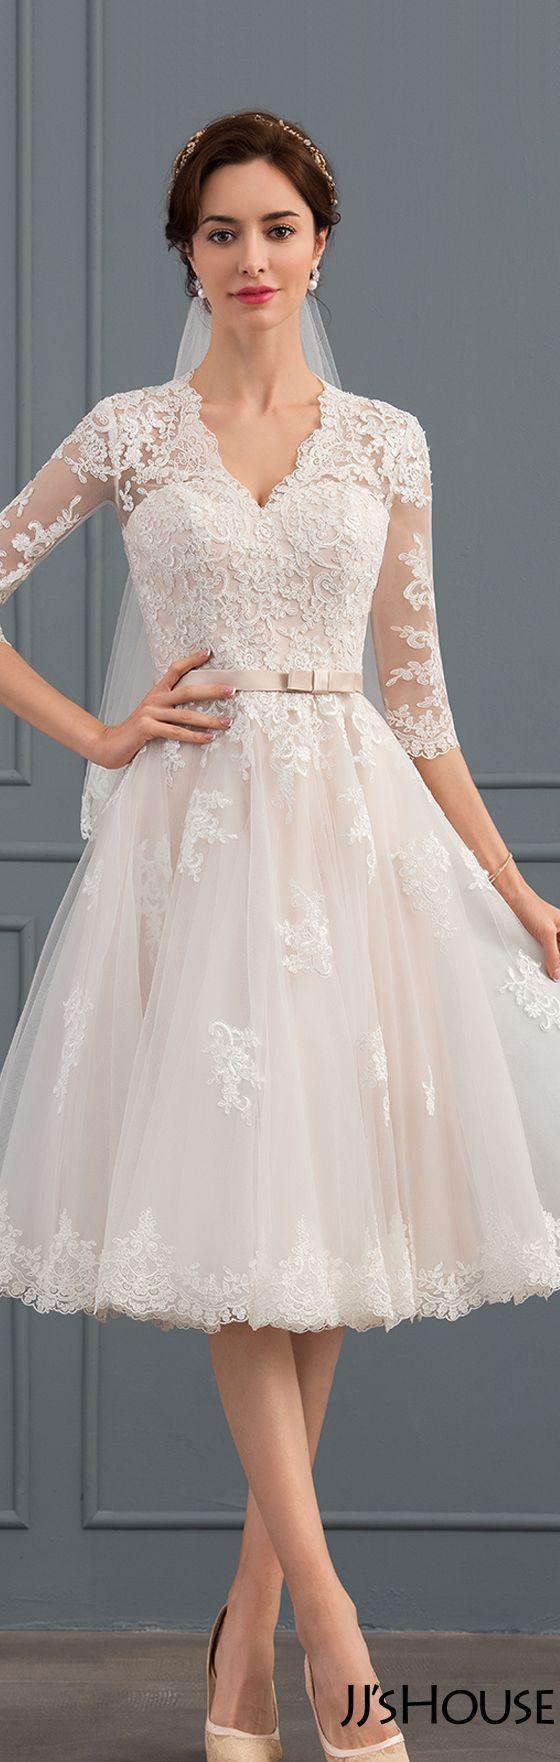 e42be38421 Such an amazing wedding dress JJsHouse Wedding